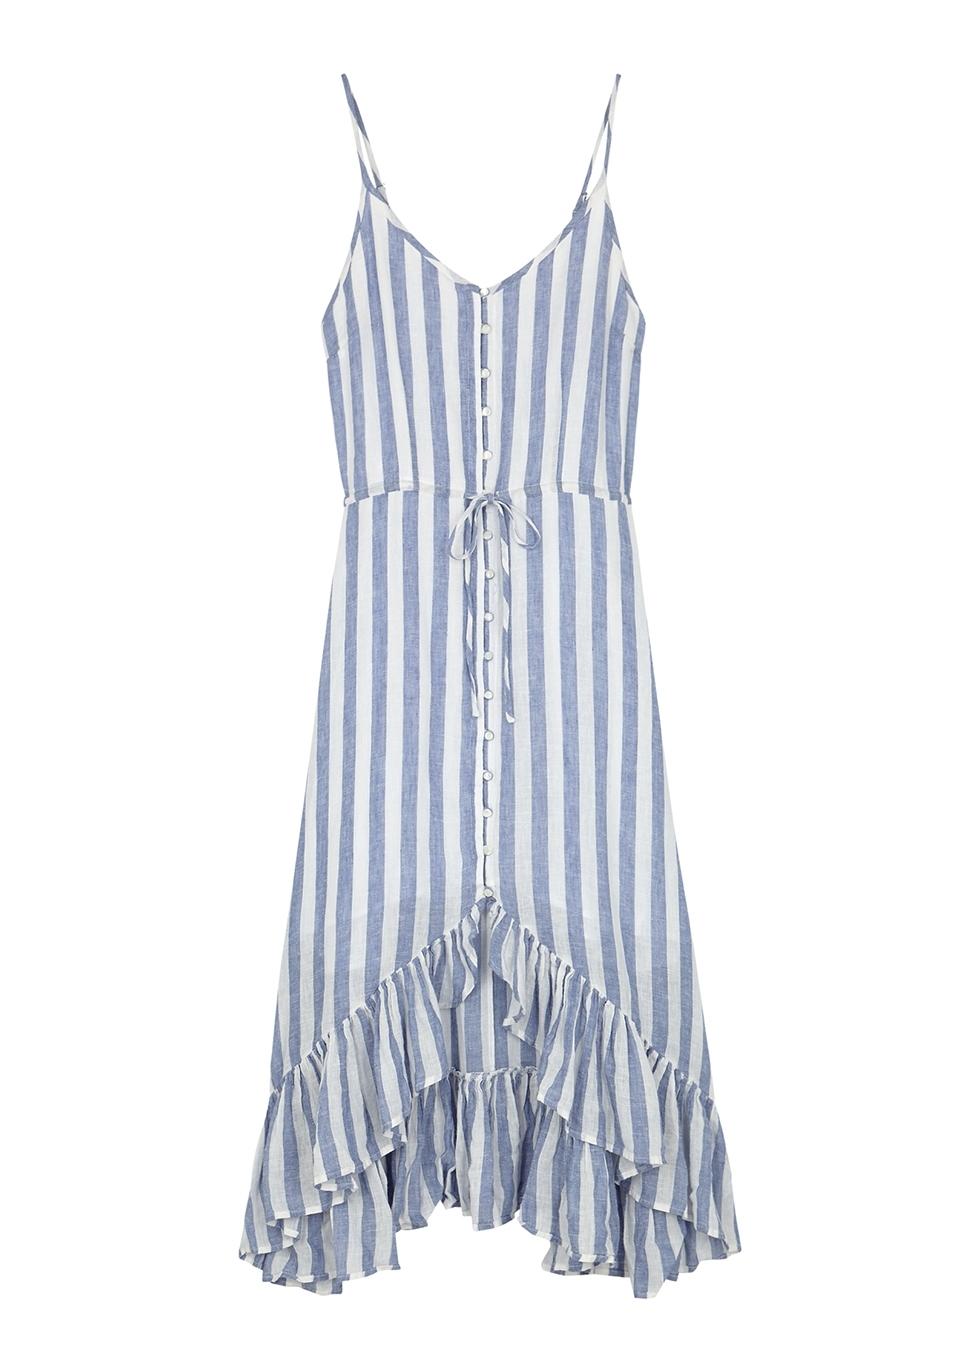 53b52950d28 Designer Dresses   Designer Gowns - Harvey Nichols